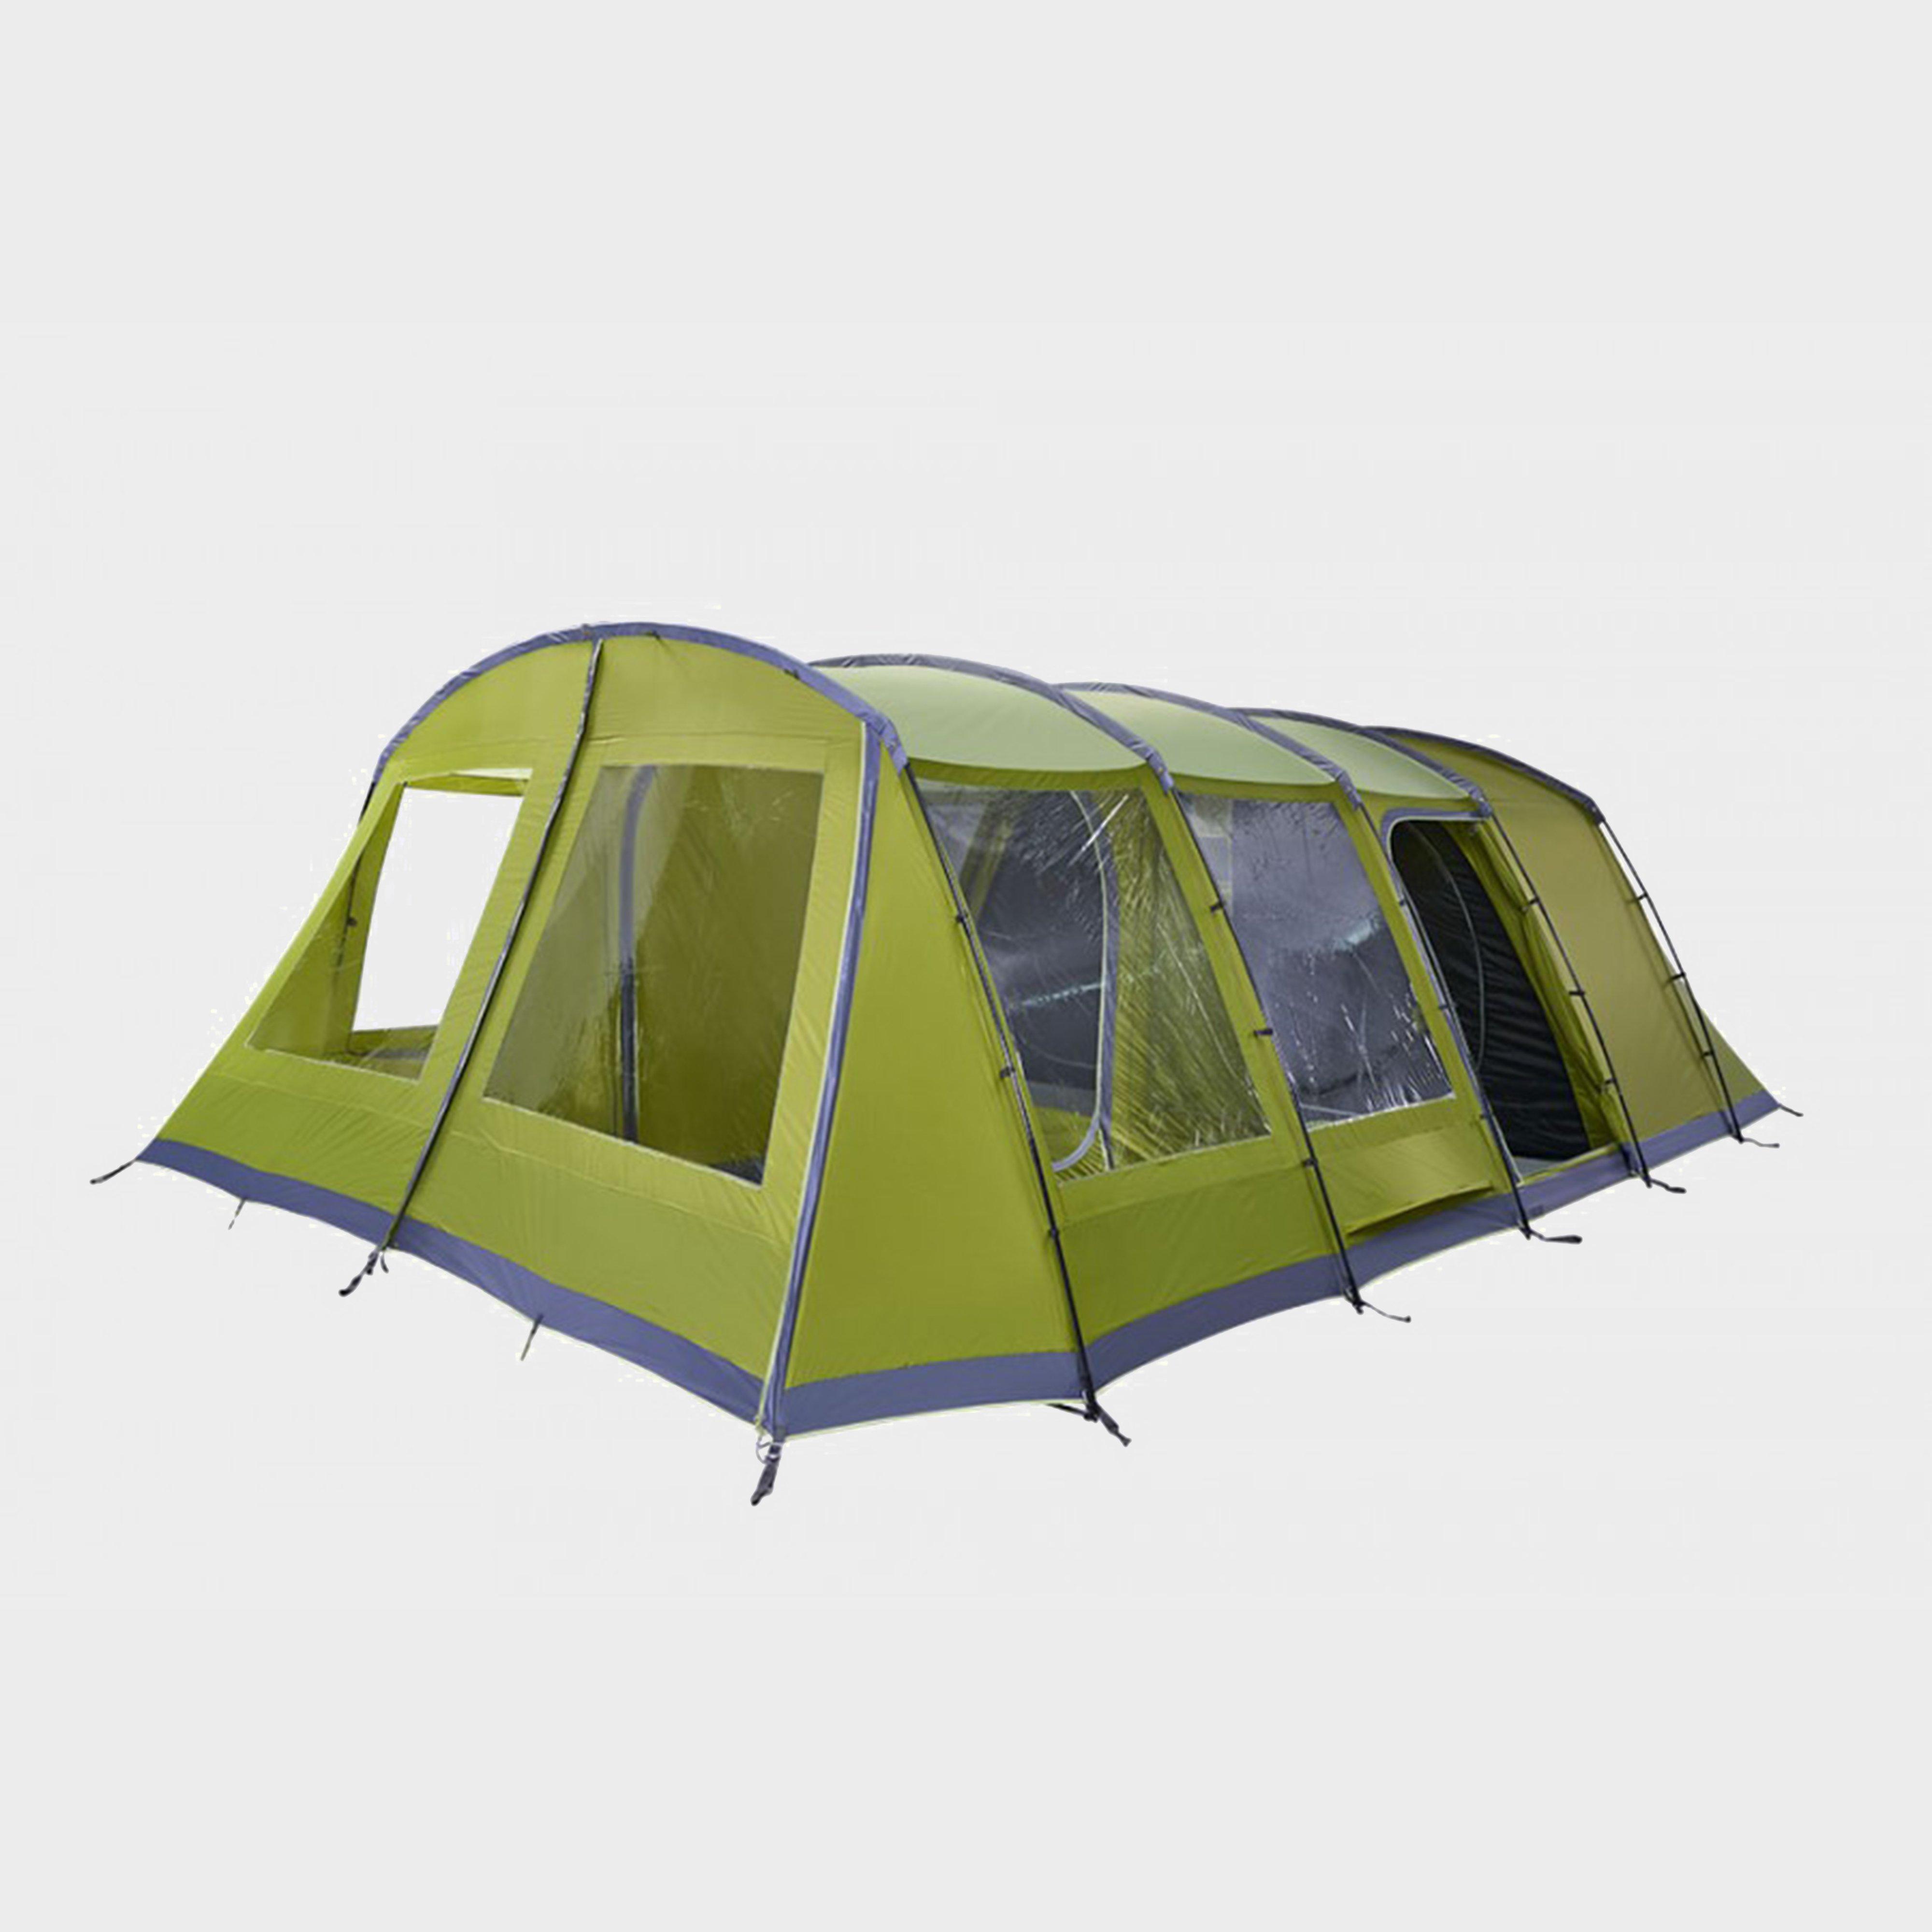 Vango Vango Casa Lux 7 Person Family Tent, Green